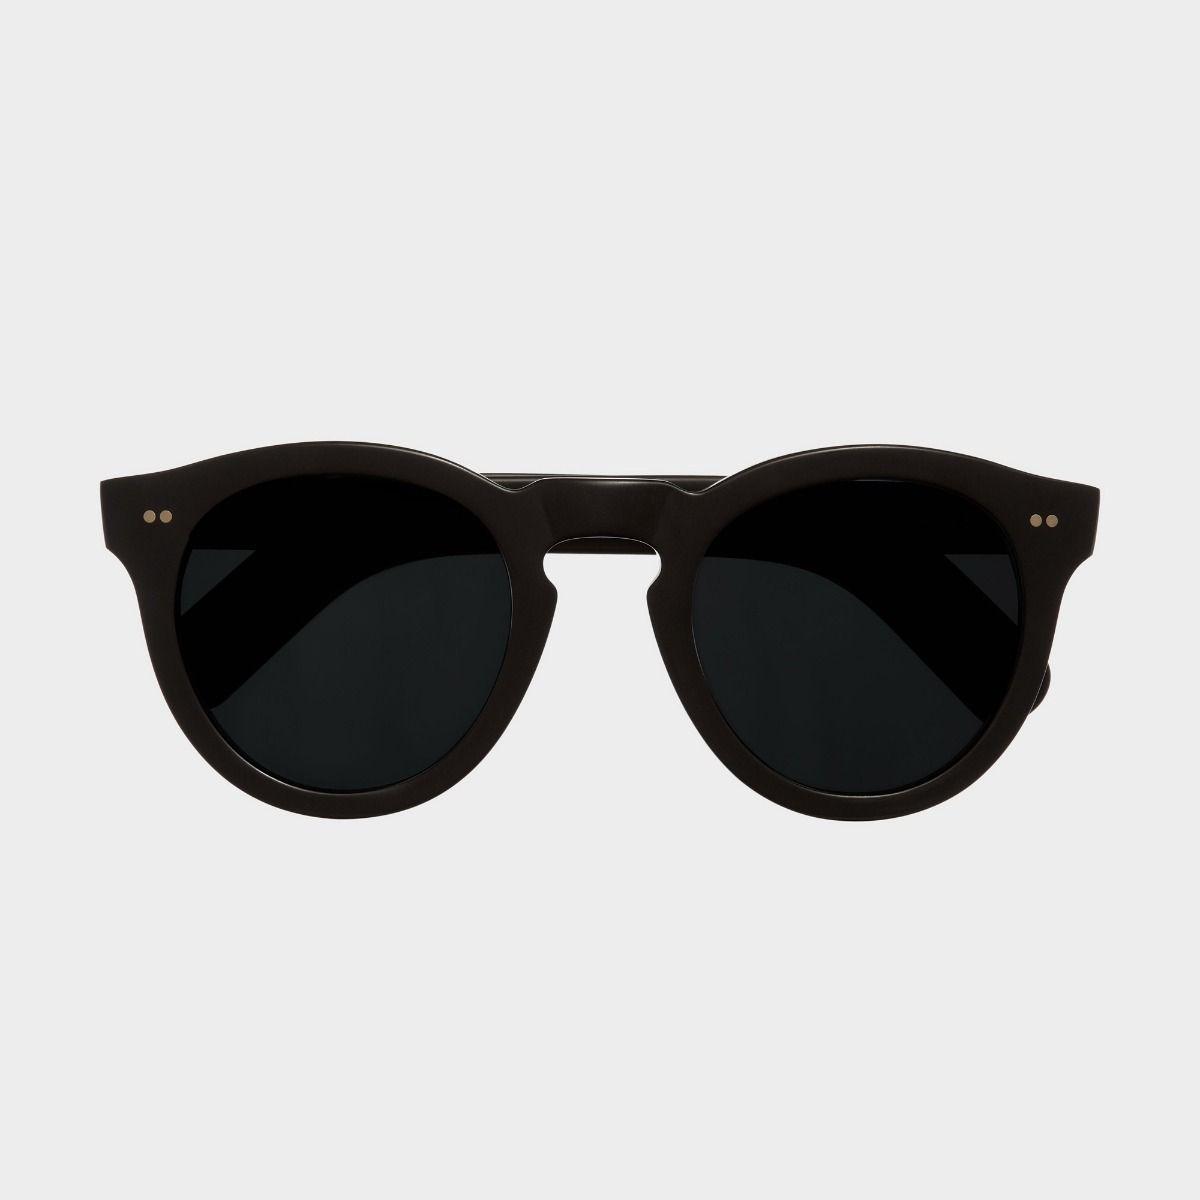 0734 Round Sunglasses (Large)-Matt Black